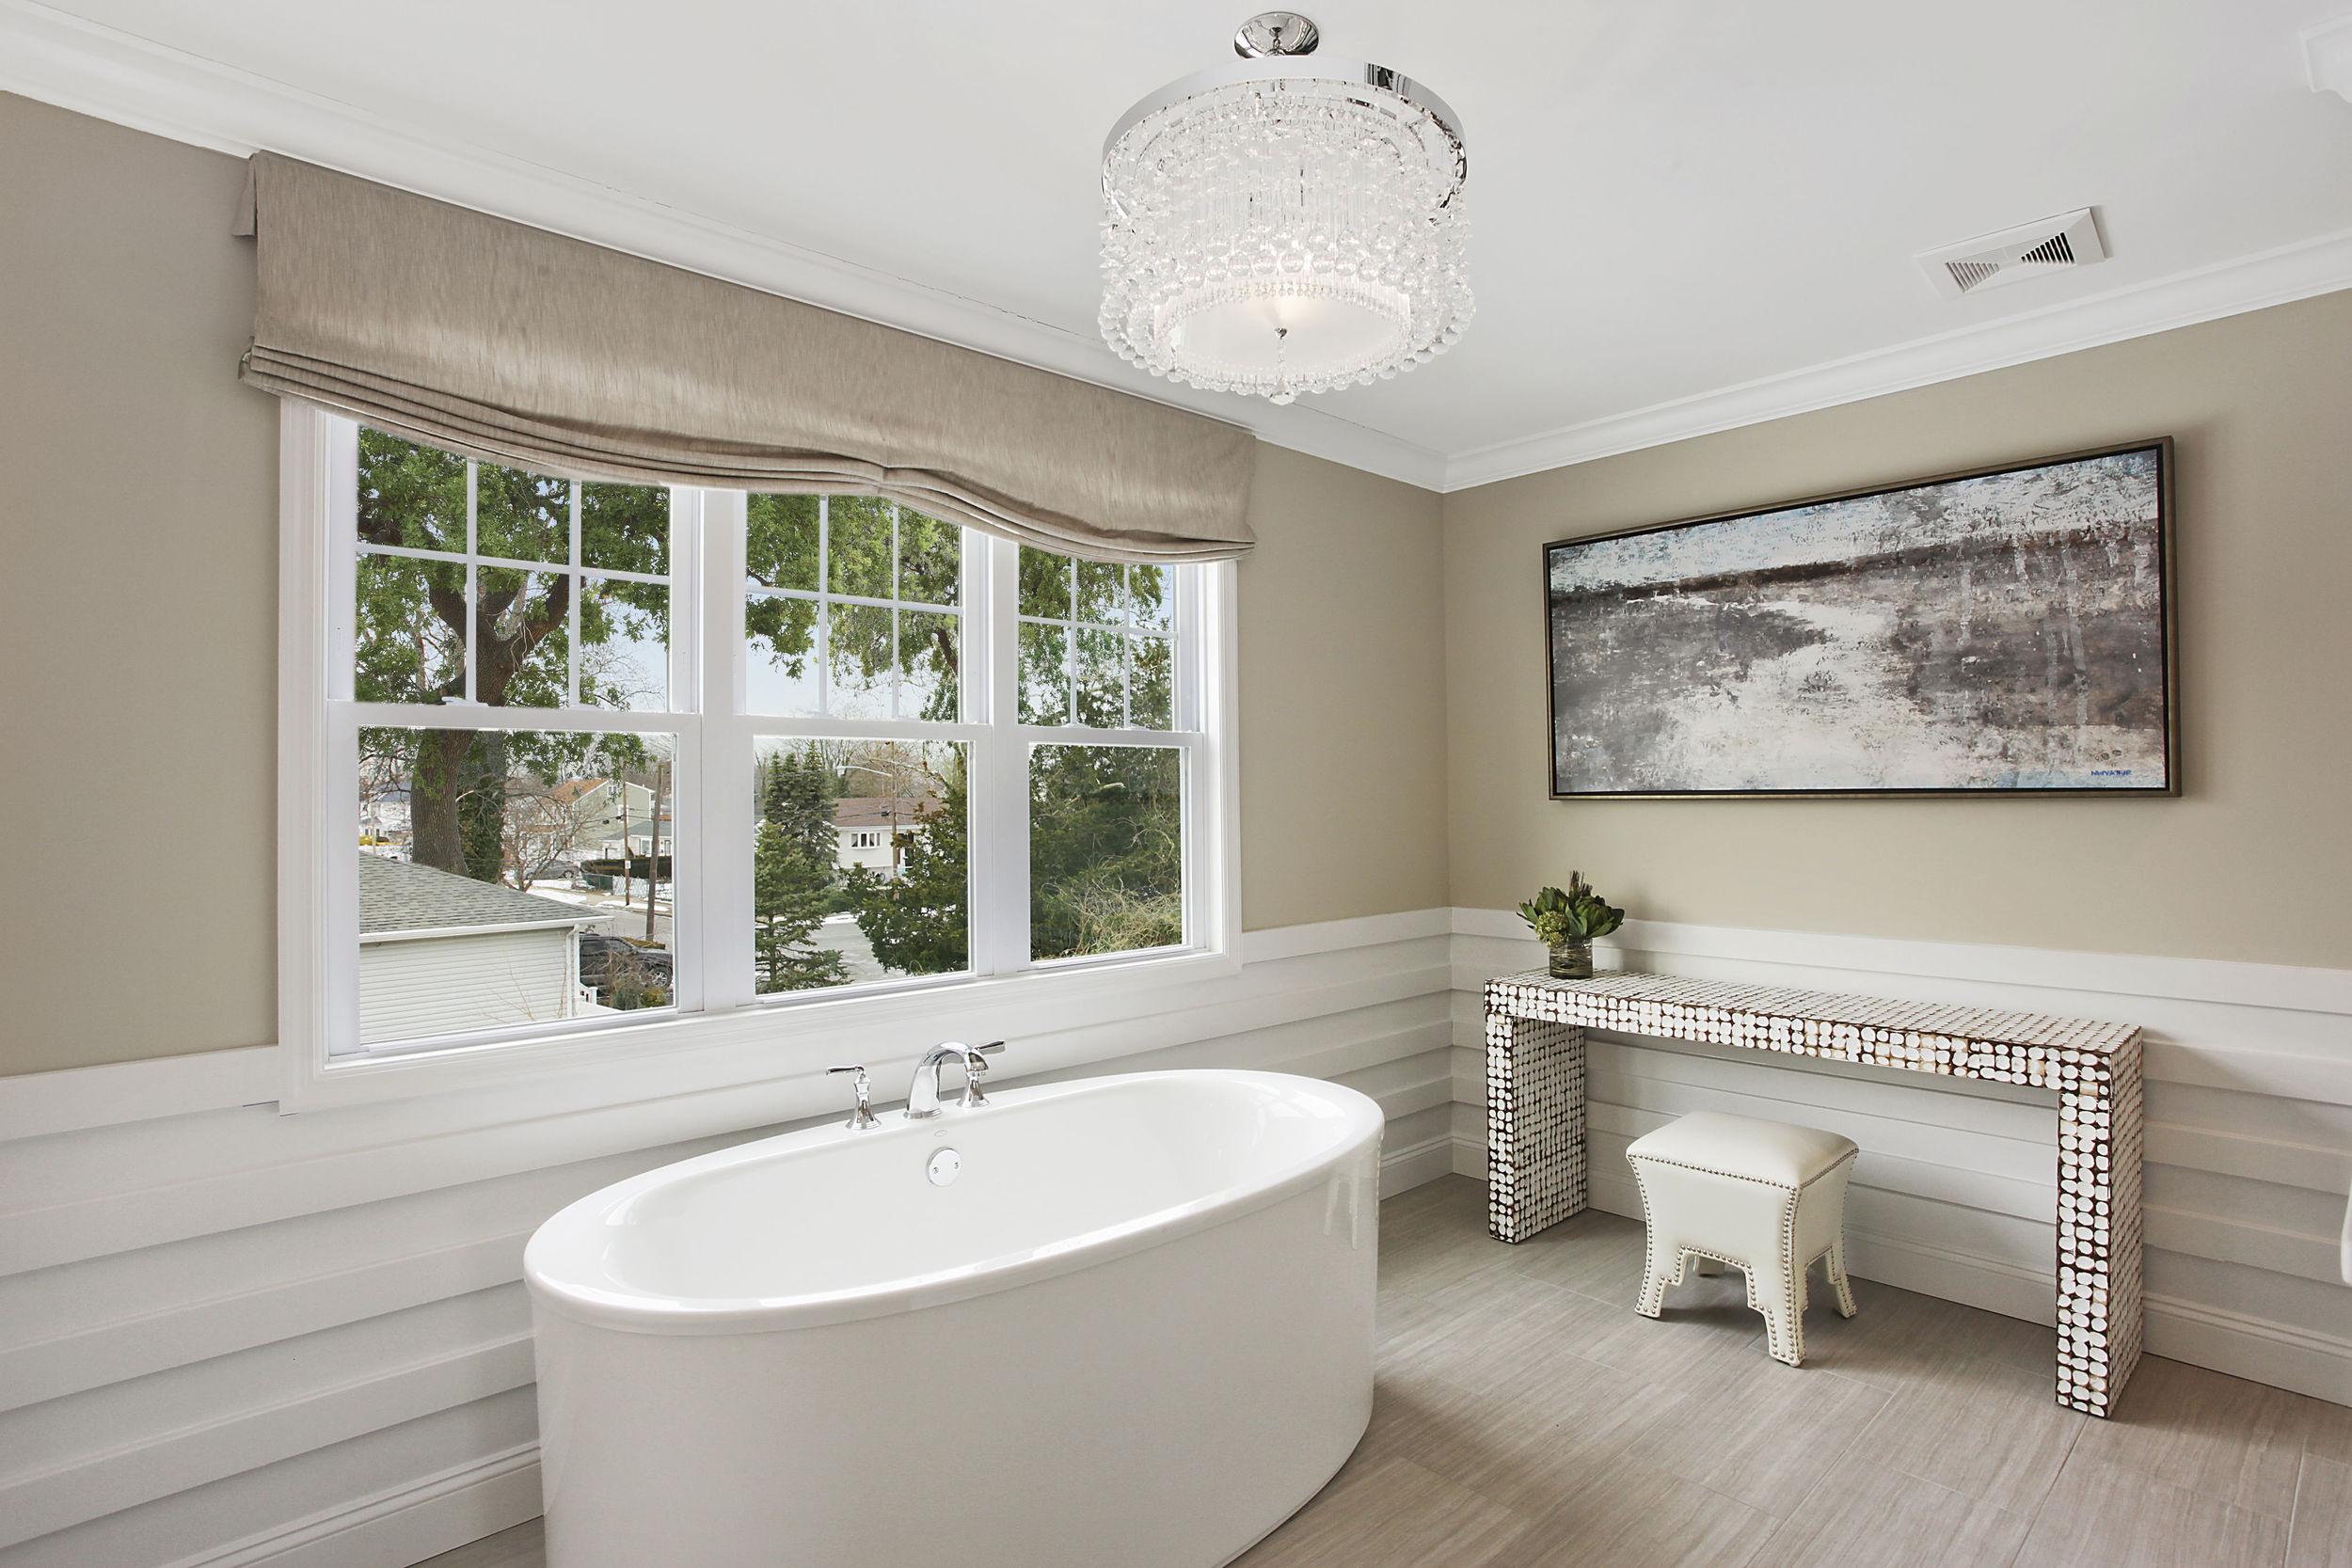 Six Simple Design Ideas to Create a Spa-Like Bathroom ... on Model Bathroom  id=40822